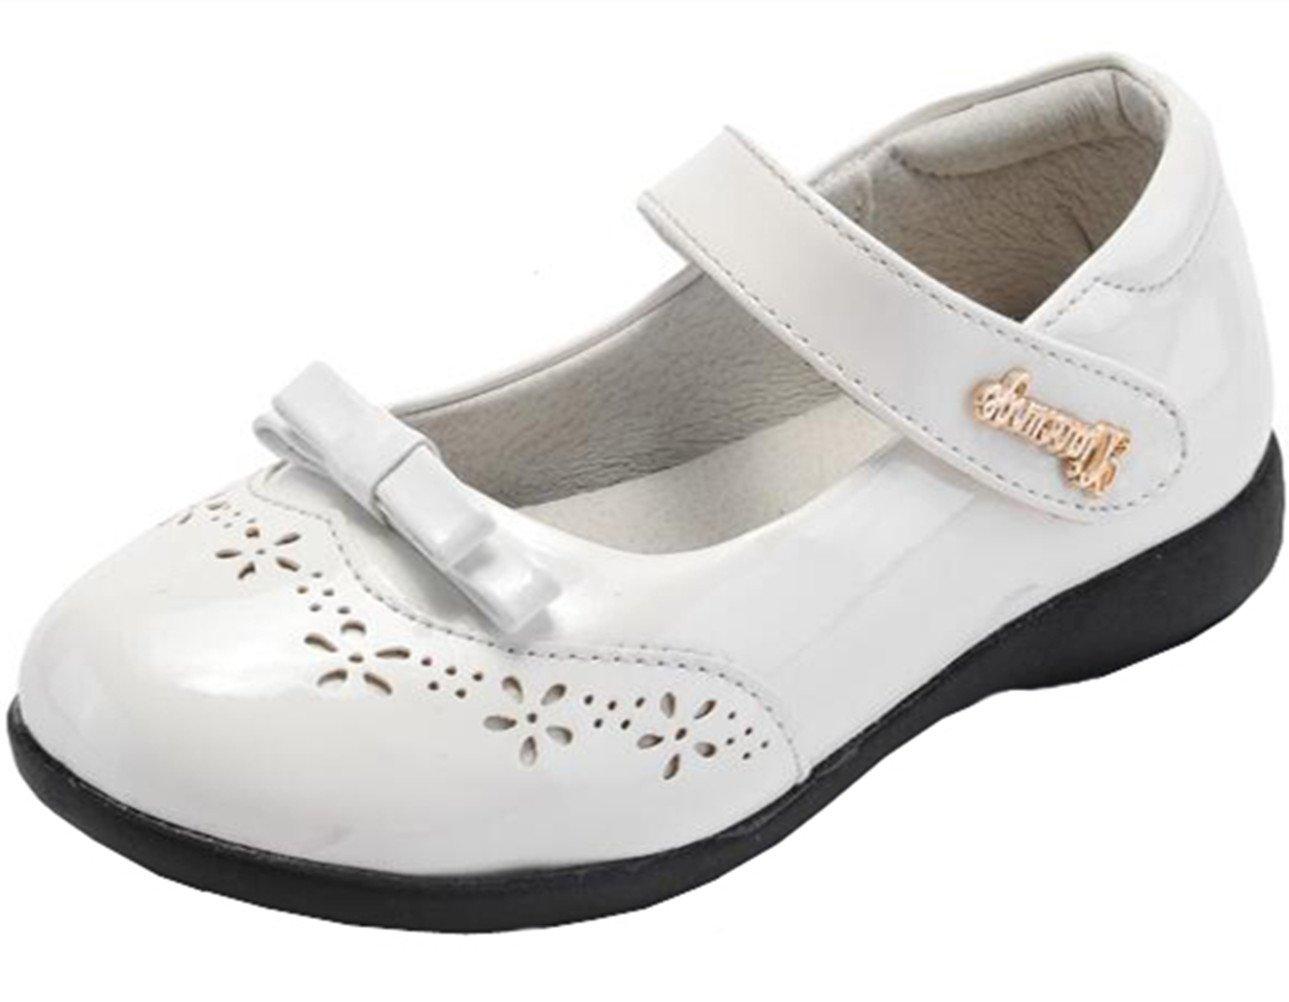 DADAWEN Girl's Mary Jane Strap School Uniform Shoe (Toddler/Little Kid/Big Kid) White US Size 3 M Little Kid